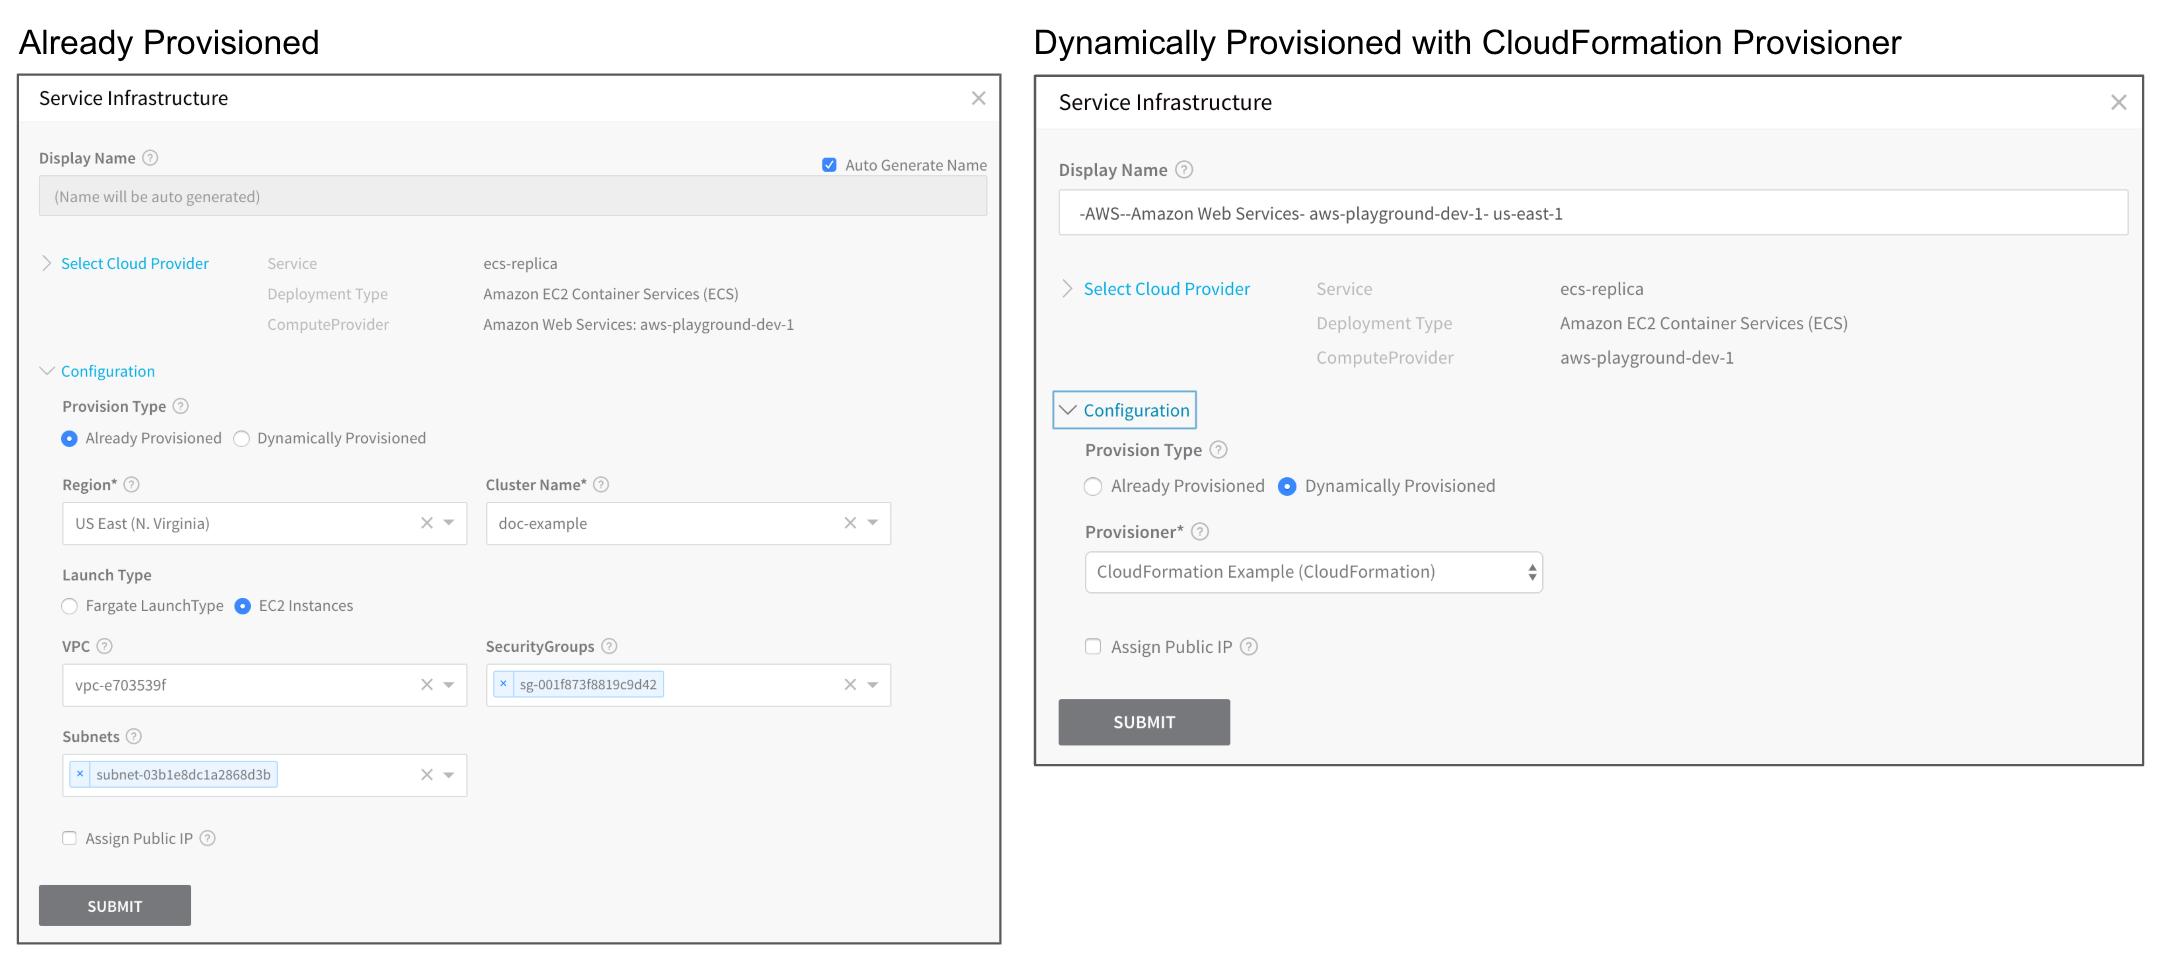 CloudFormation Provisioner - Harness io Docs